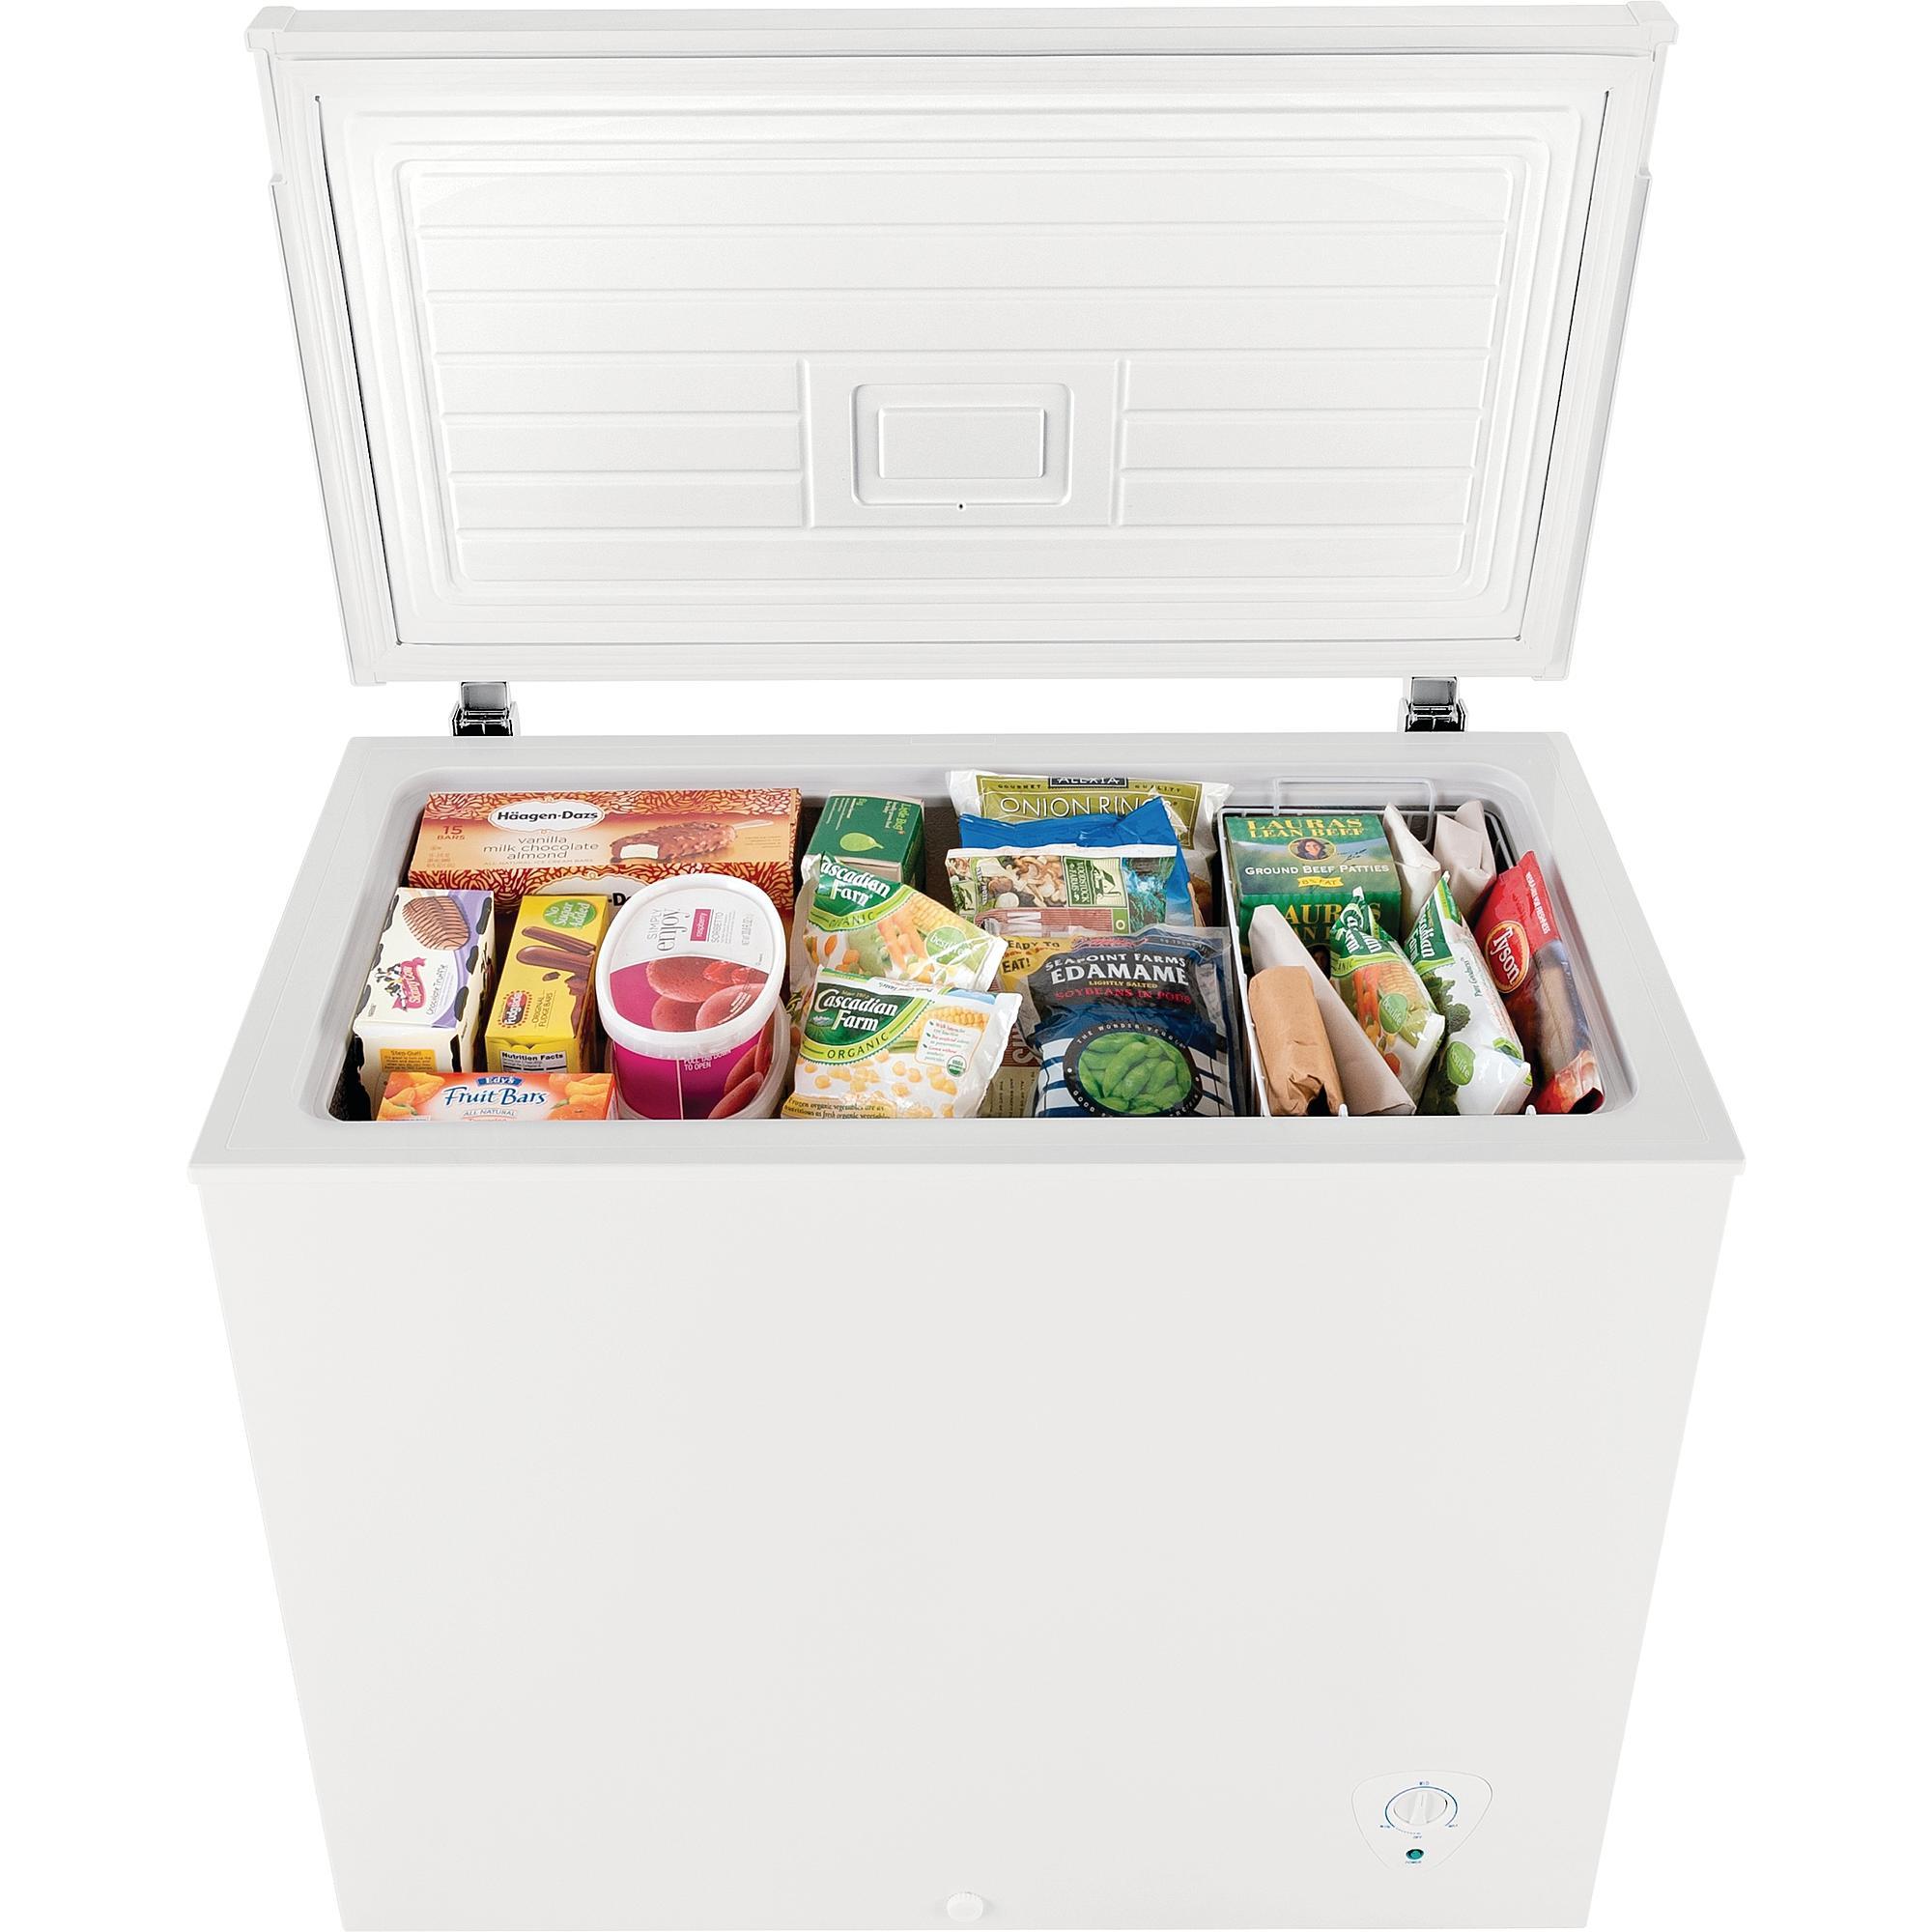 Common freezer problems - high-temperature alarm sounds